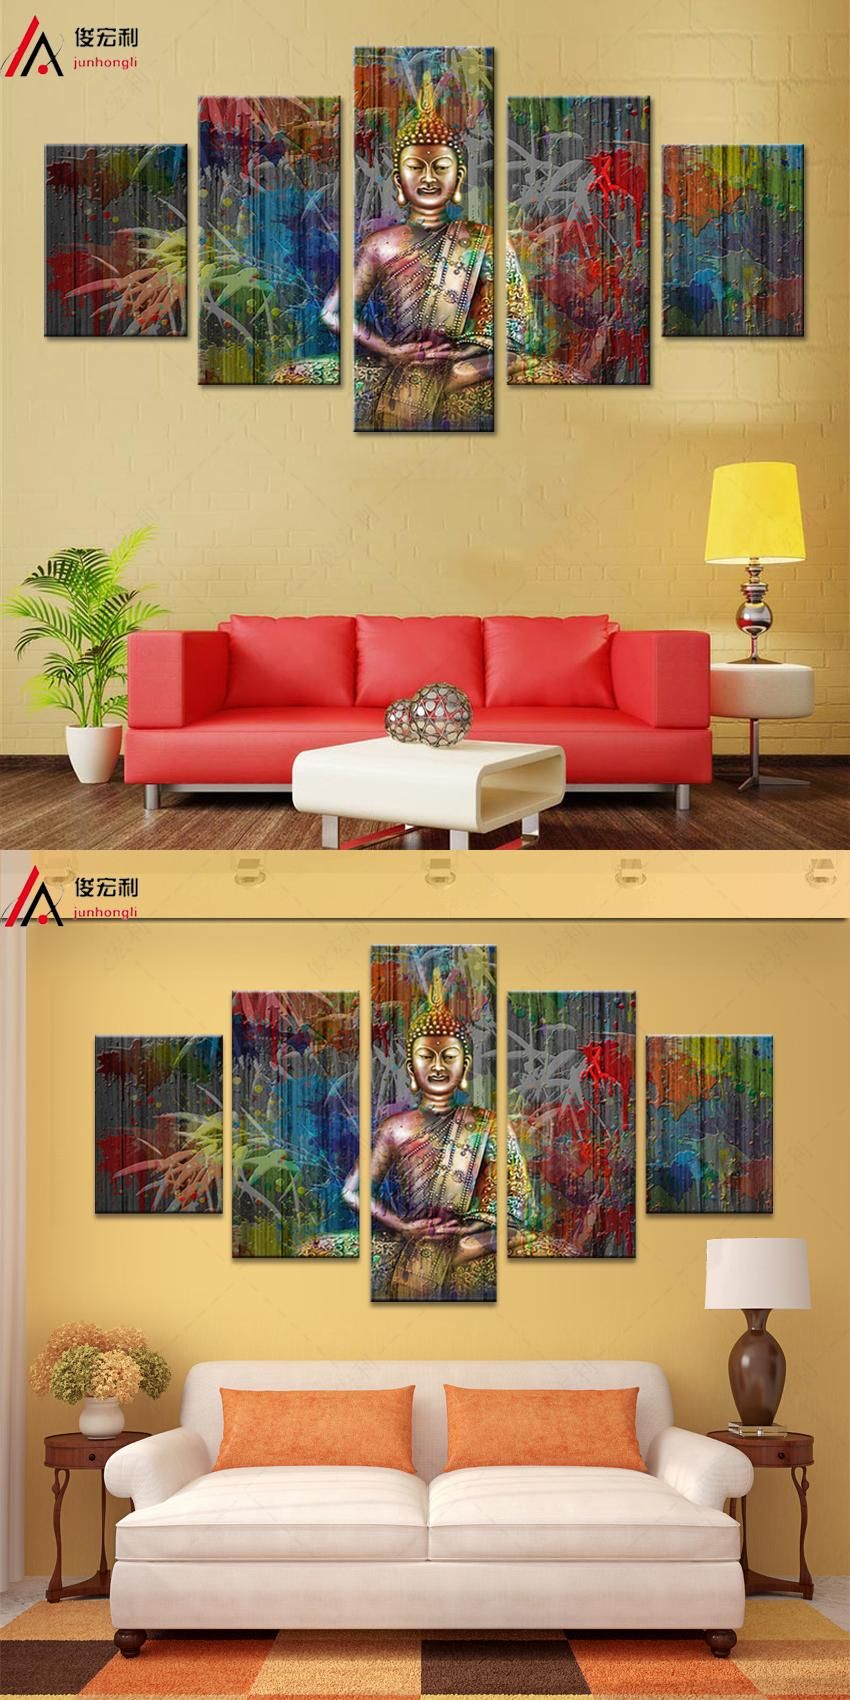 Visit to Buy] 5 piece canvas art wall art canvas prints modular ...